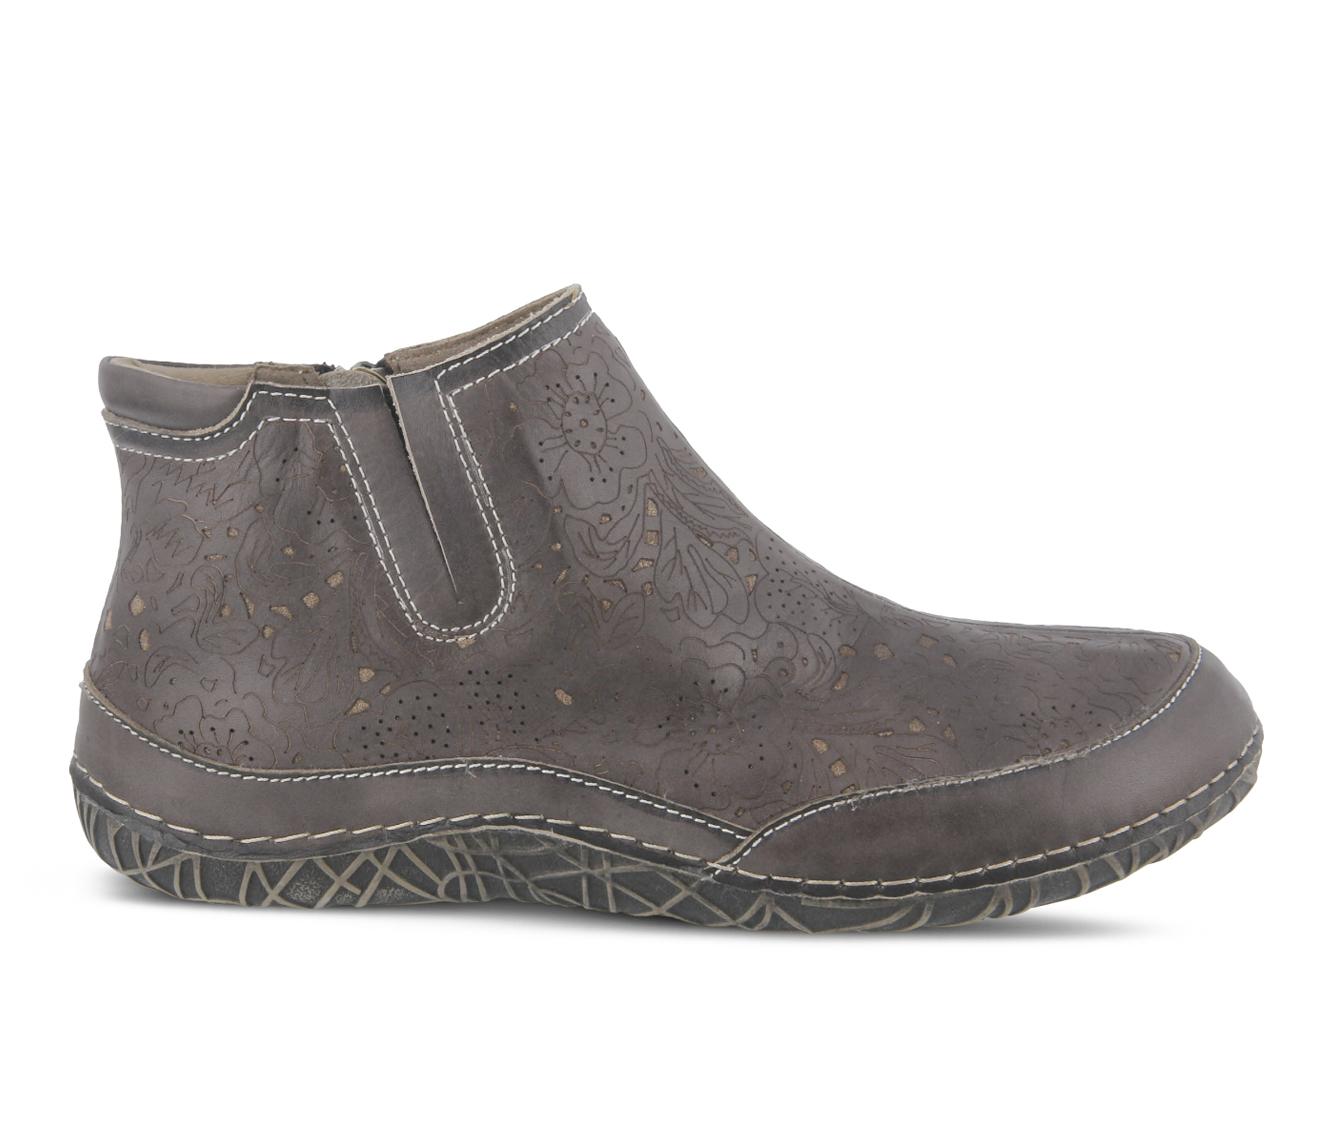 L'Artiste Libootie Women's Boots (Brown Leather)